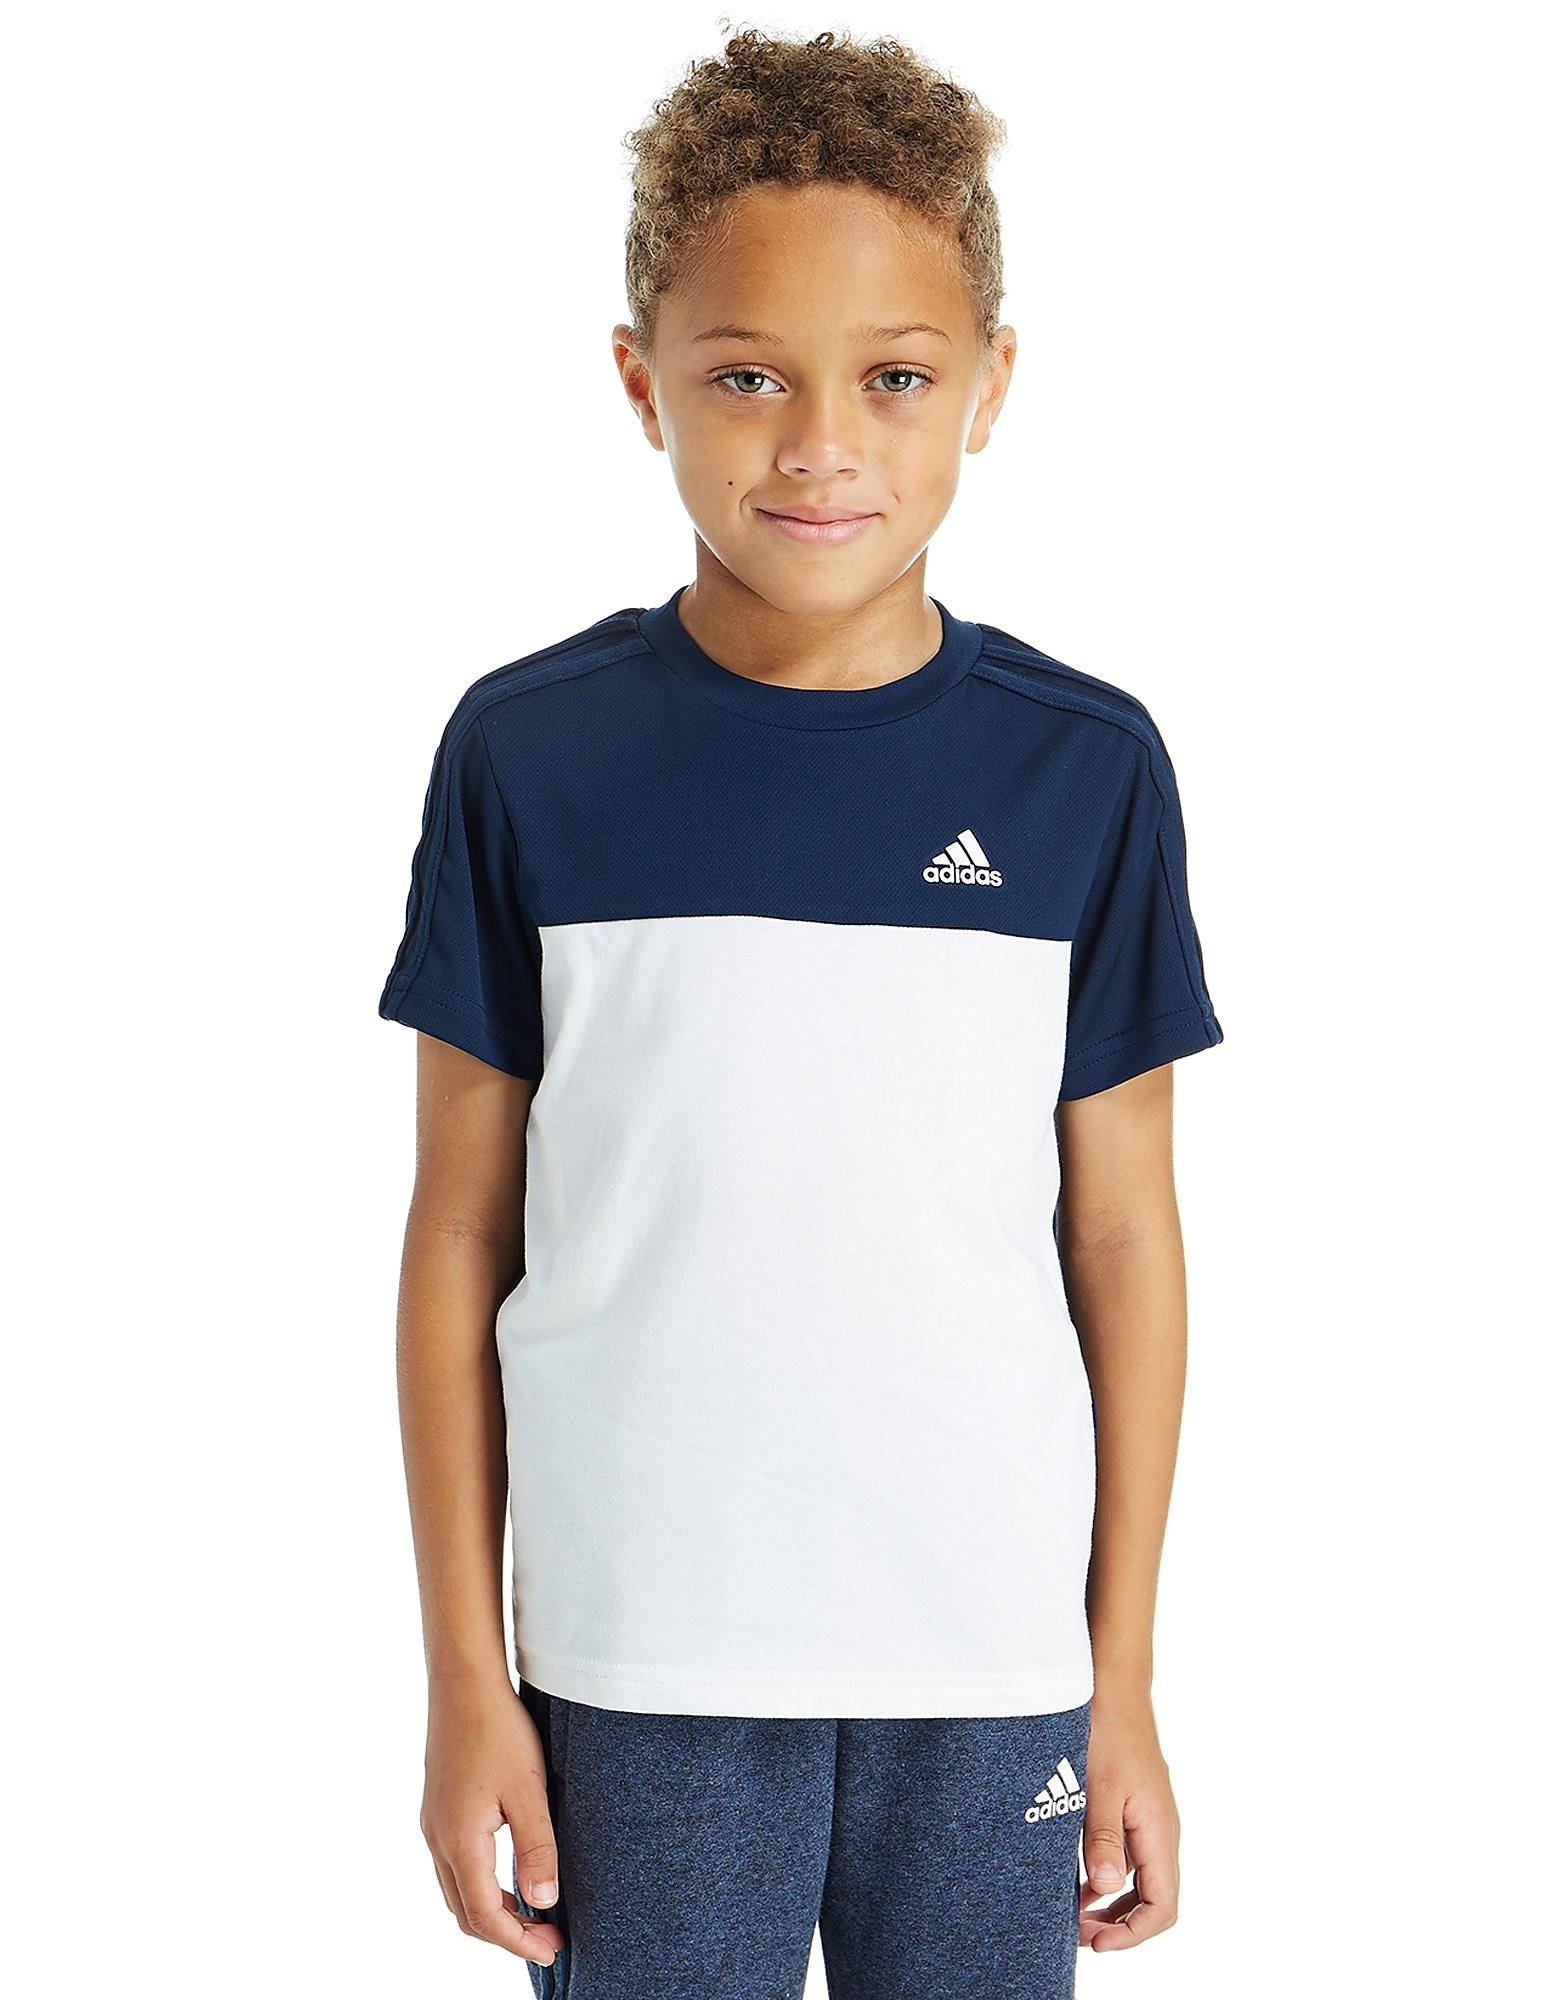 adidas Hybird T-Shirt Bambino